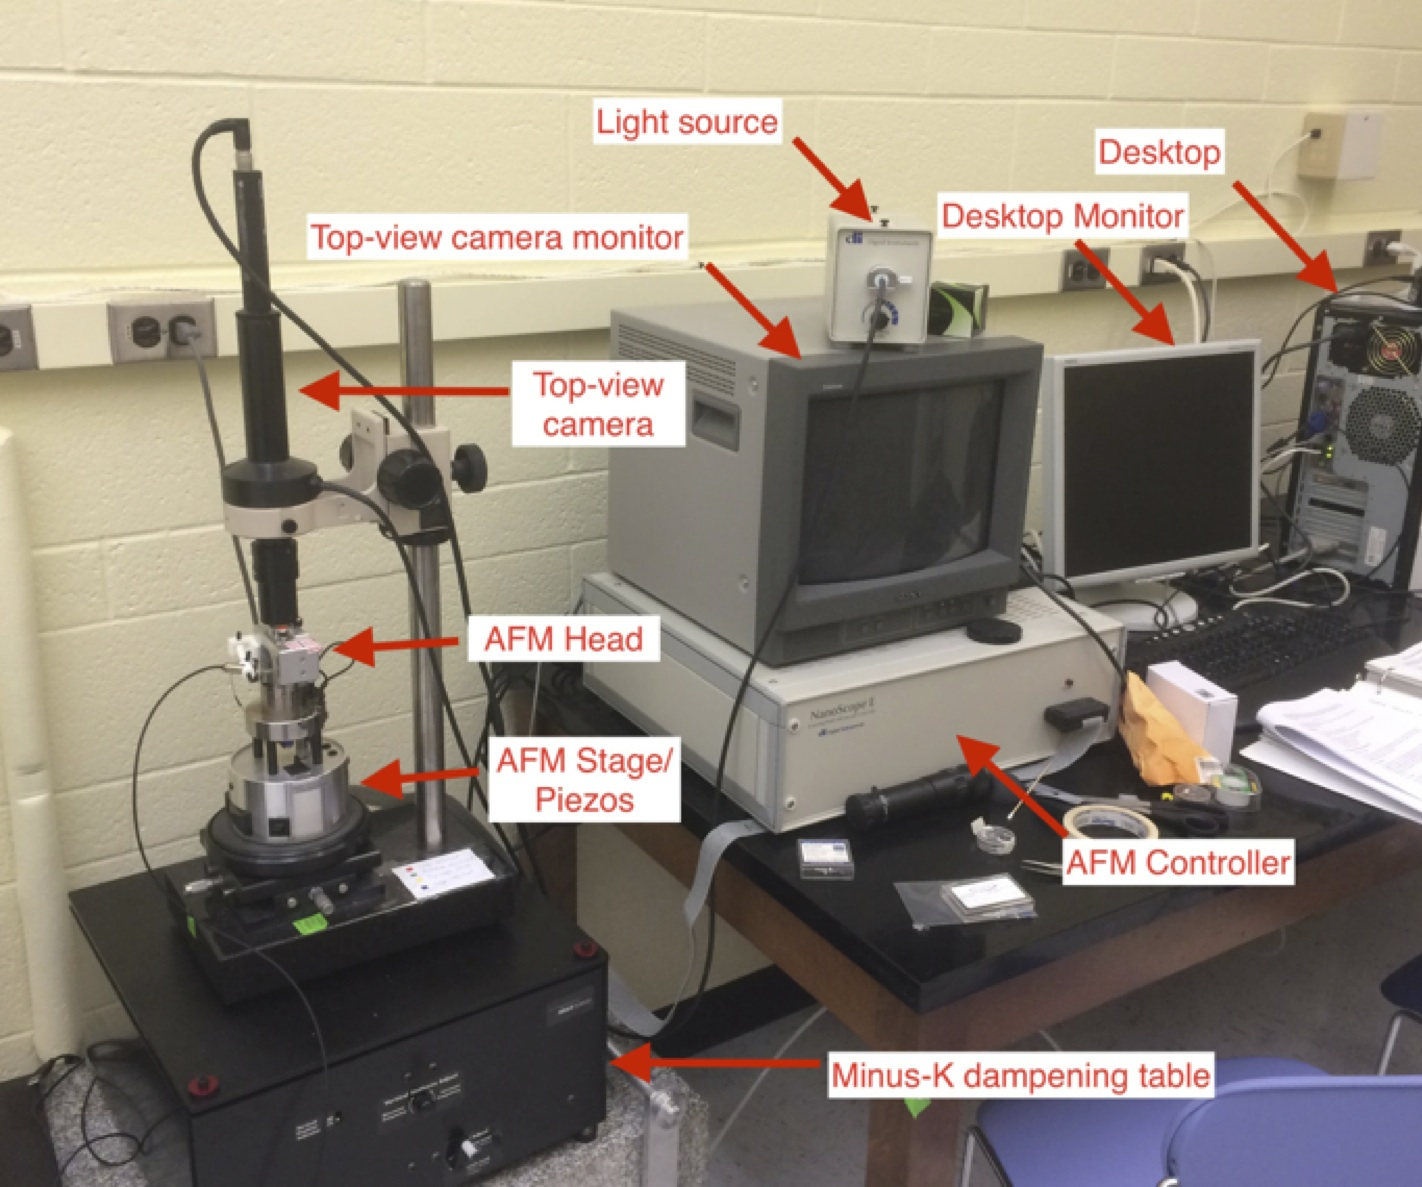 AFM: Atomic Force Microscope